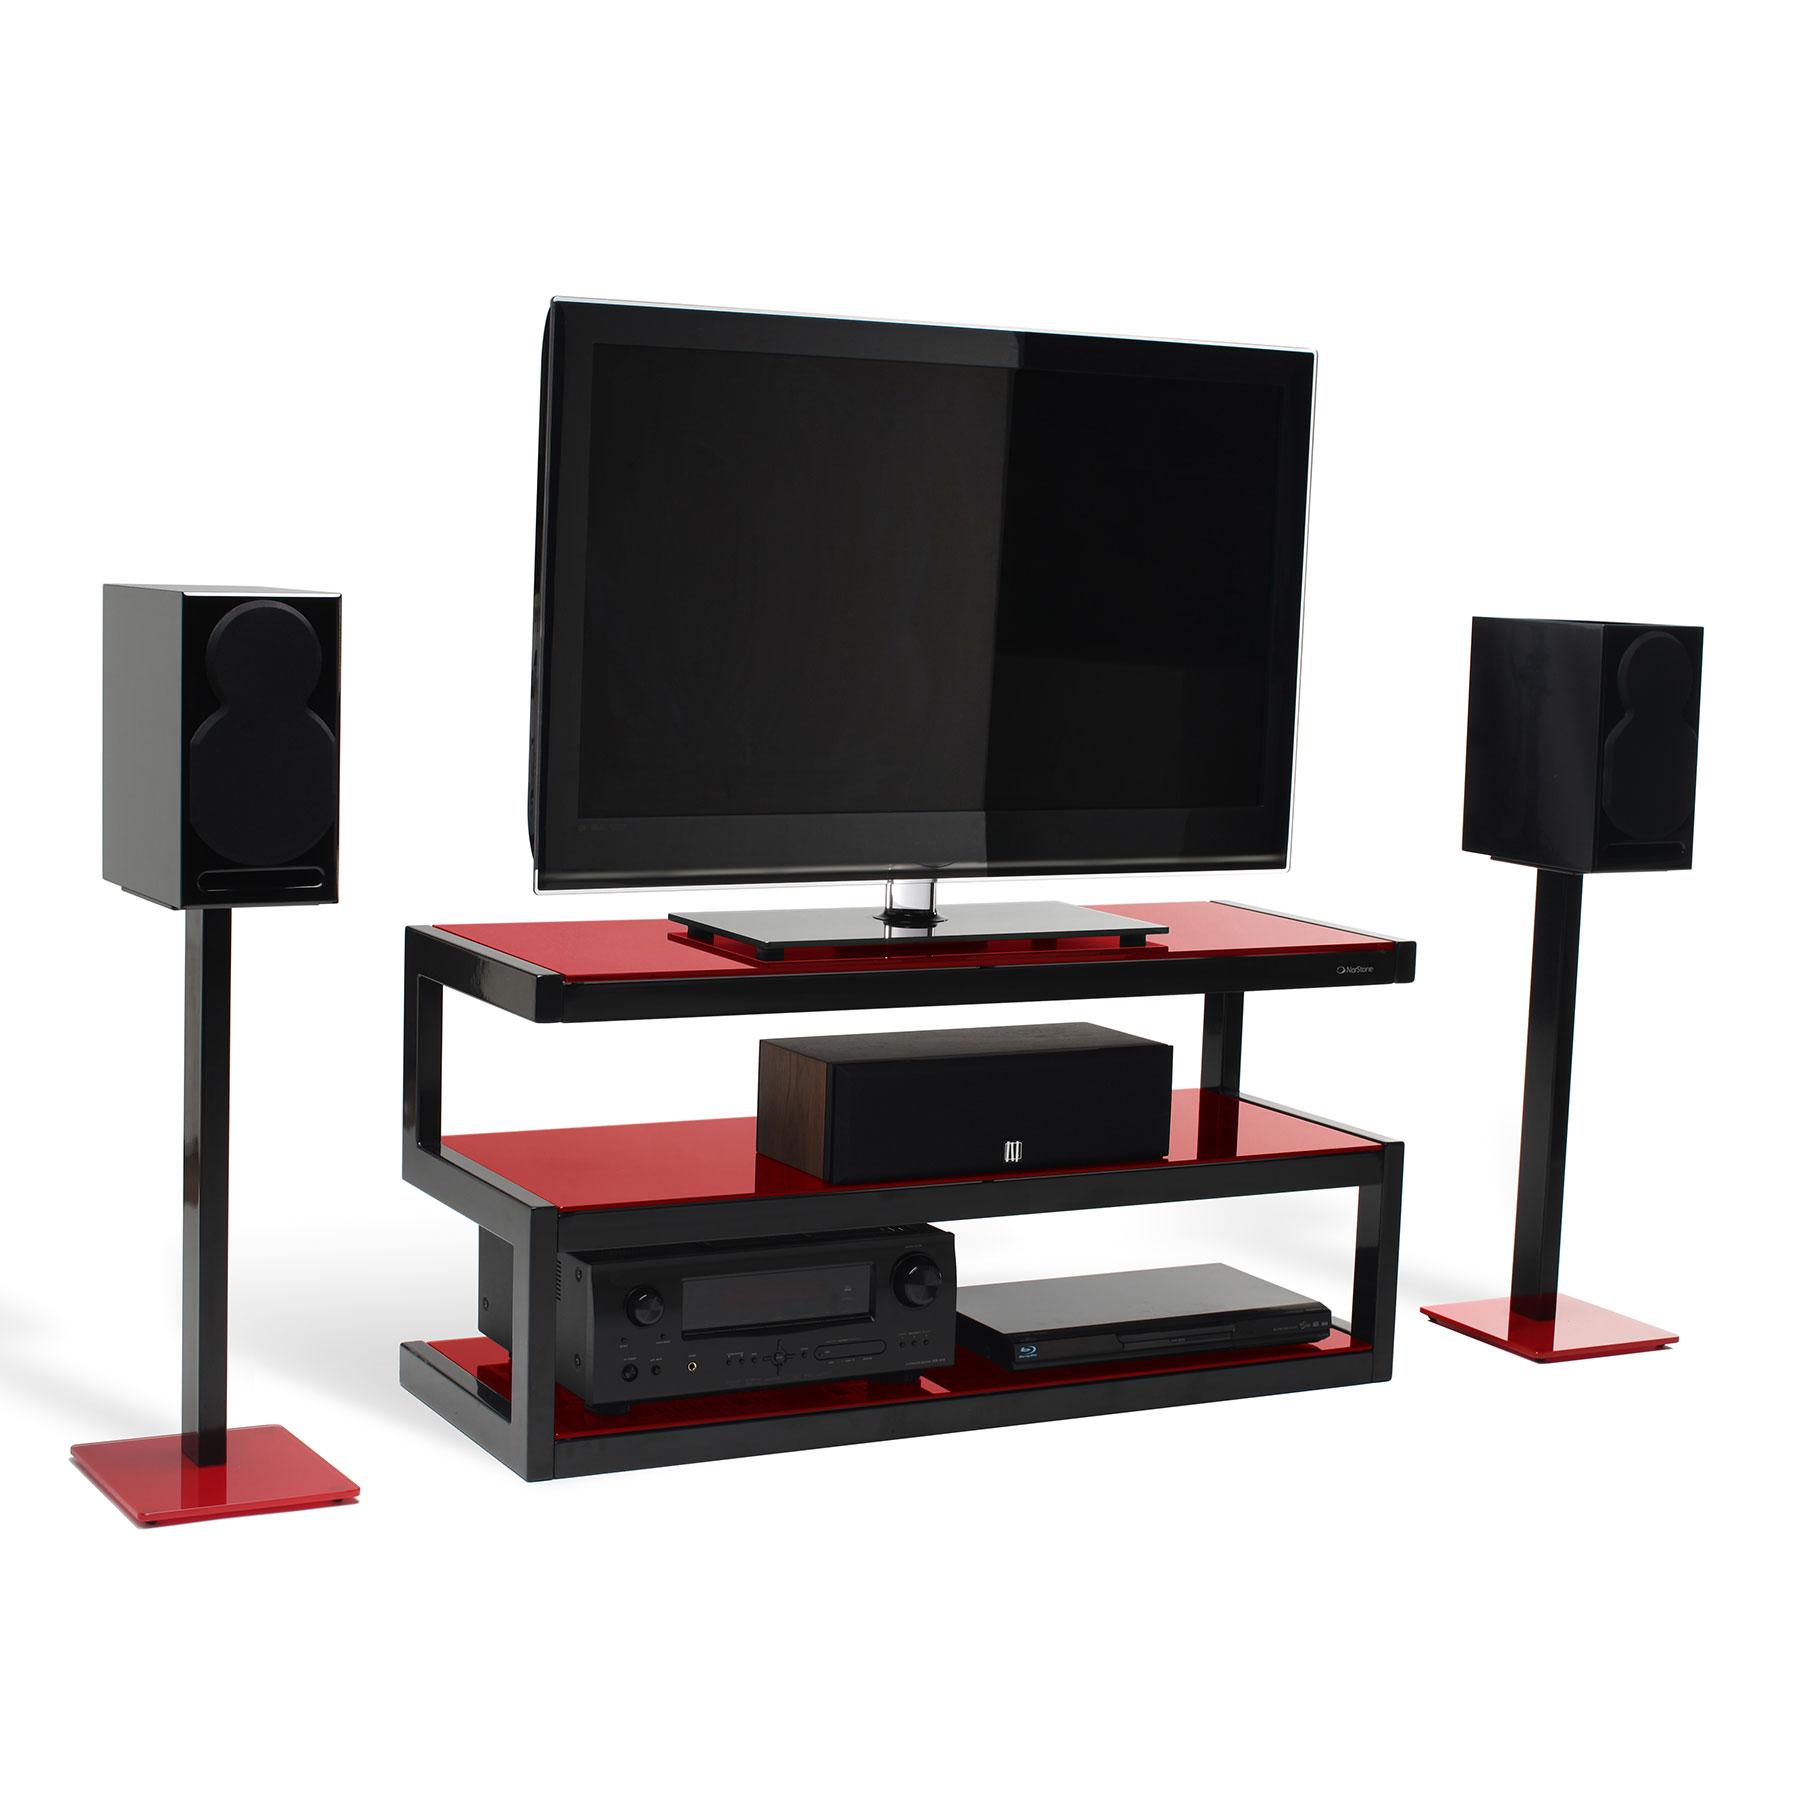 Meuble Tv Norstone Esse - Norstone Esse Meuble Tv Norstone Sur Ldlc Com[mjhdah]https://www.cobra.fr/media/catalog/product/cache/1/image/9df78eab33525d08d6e5fb8d27136e95/n/o/norstone_esse_curve_5_.jpg